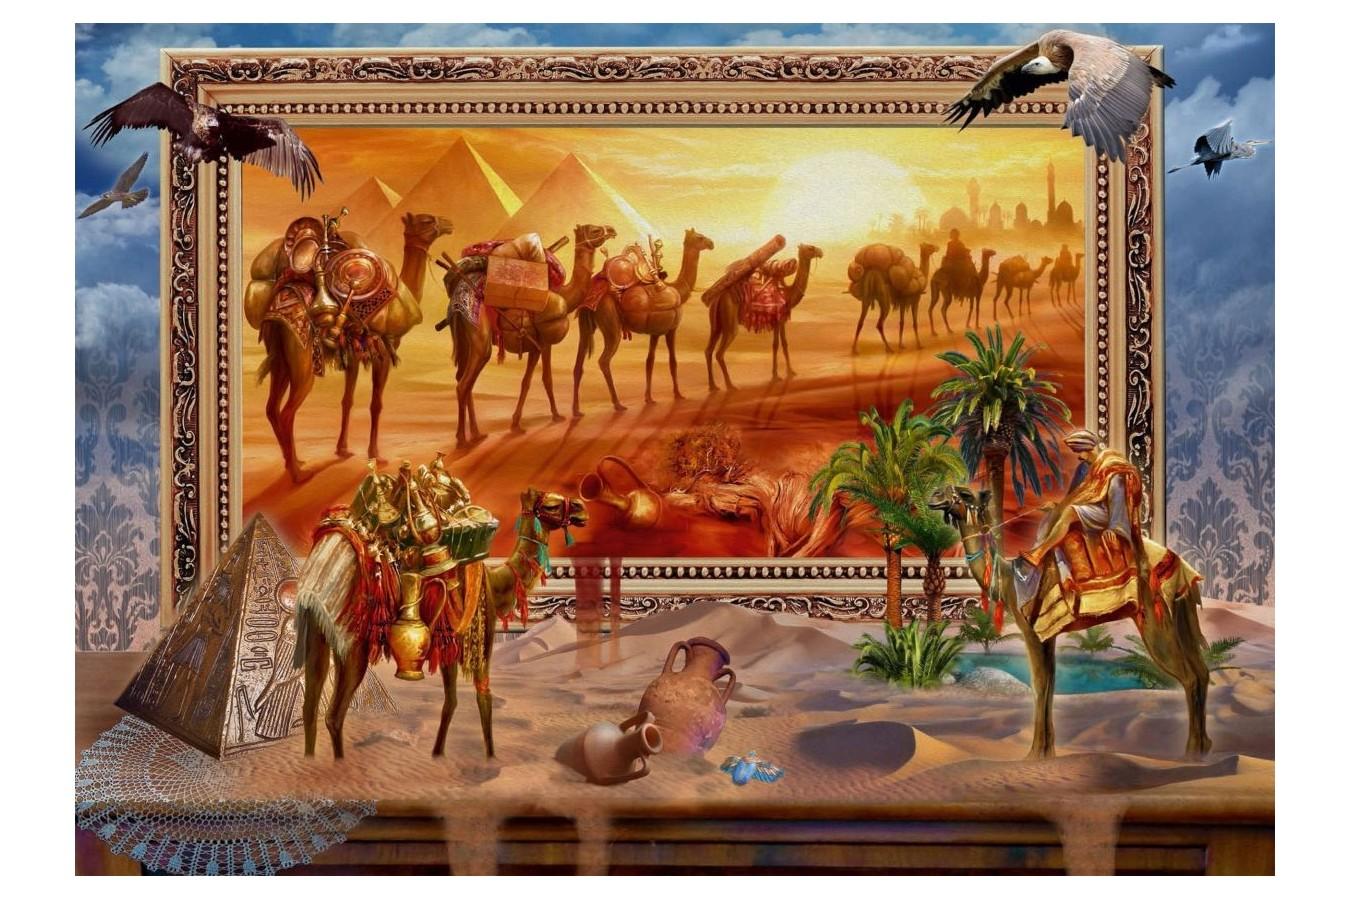 Puzzle Schmidt - Jan Patrik Krasny: Lumea egipteana prinzand viata, 1.000 piese (59338)